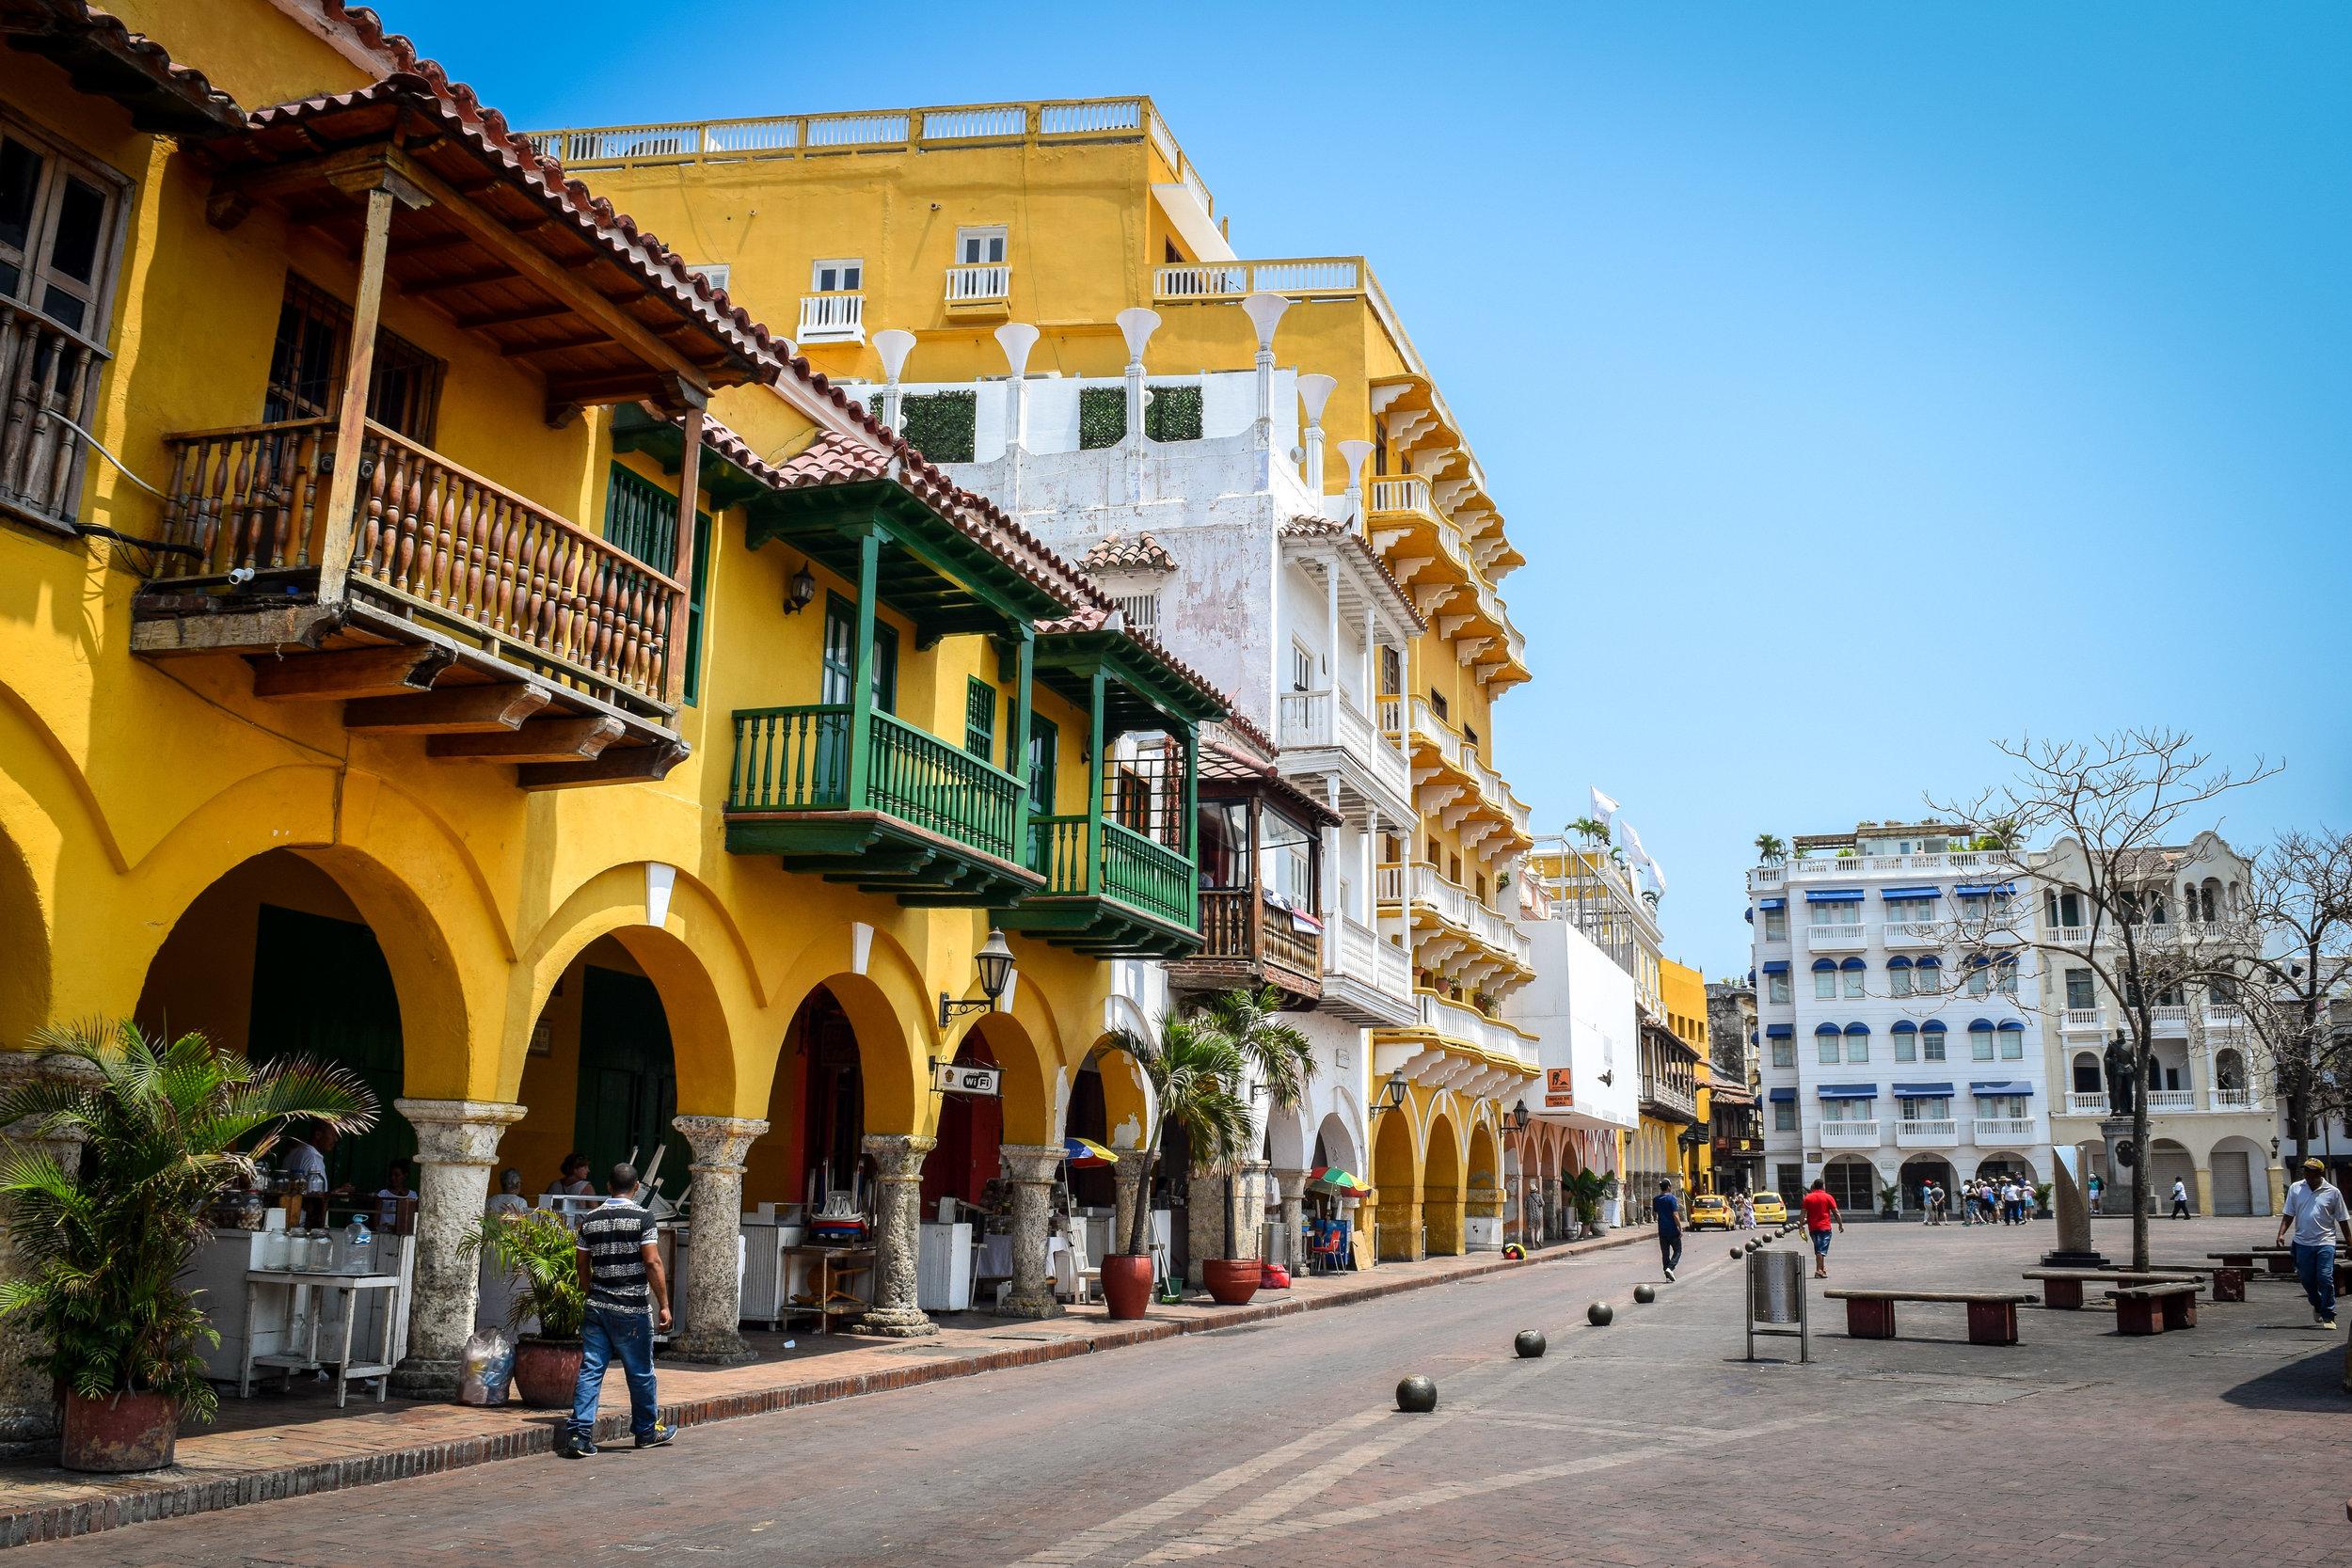 Cartagena's+Old+Town